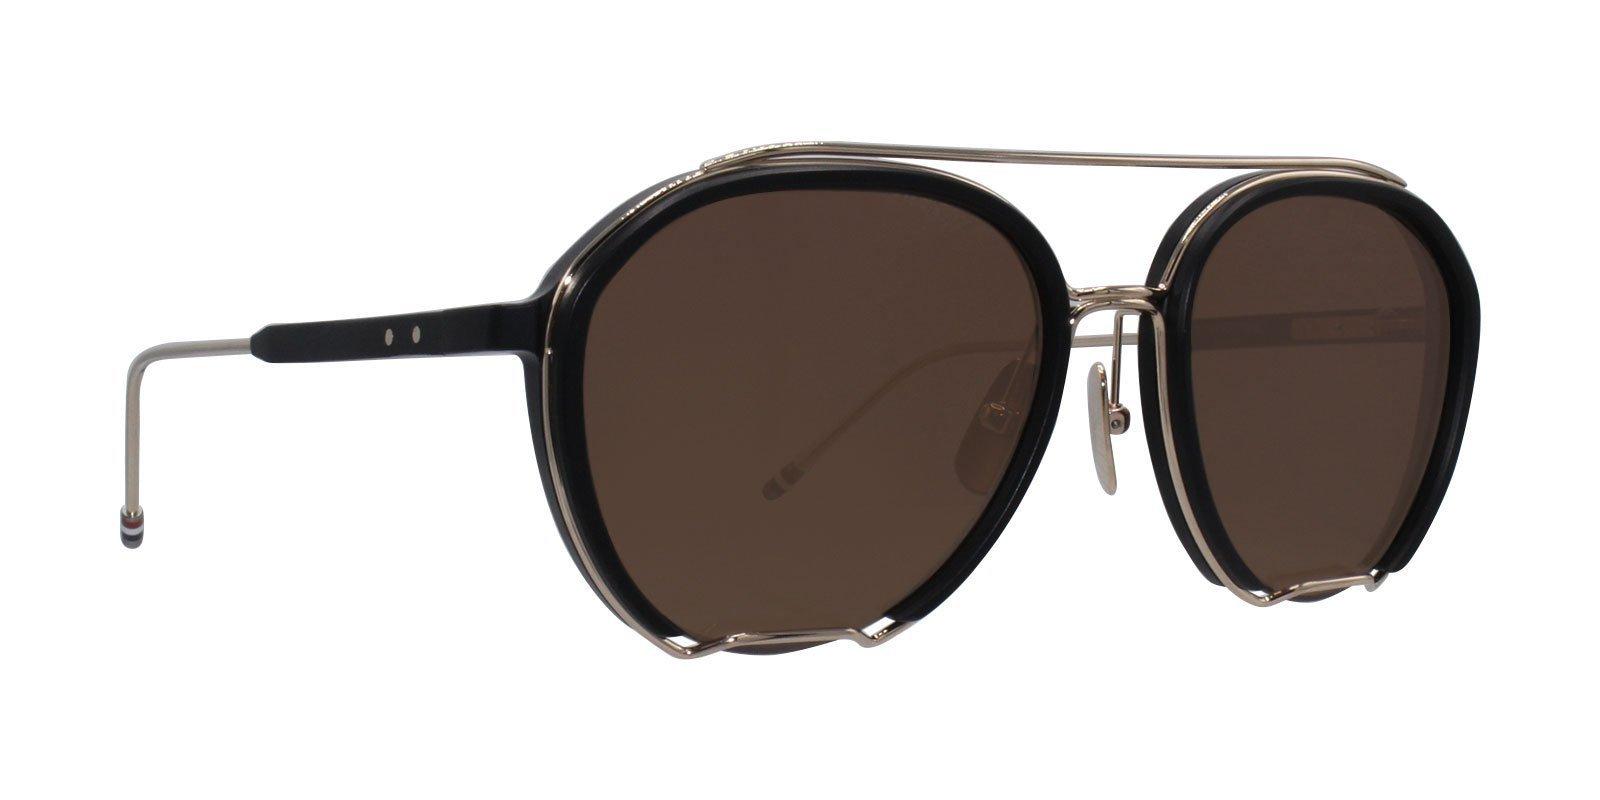 6fa0f3ea8ad Thom Browne - TB-810 Black Gold - Brown-sunglasses-Designer Eyes ...